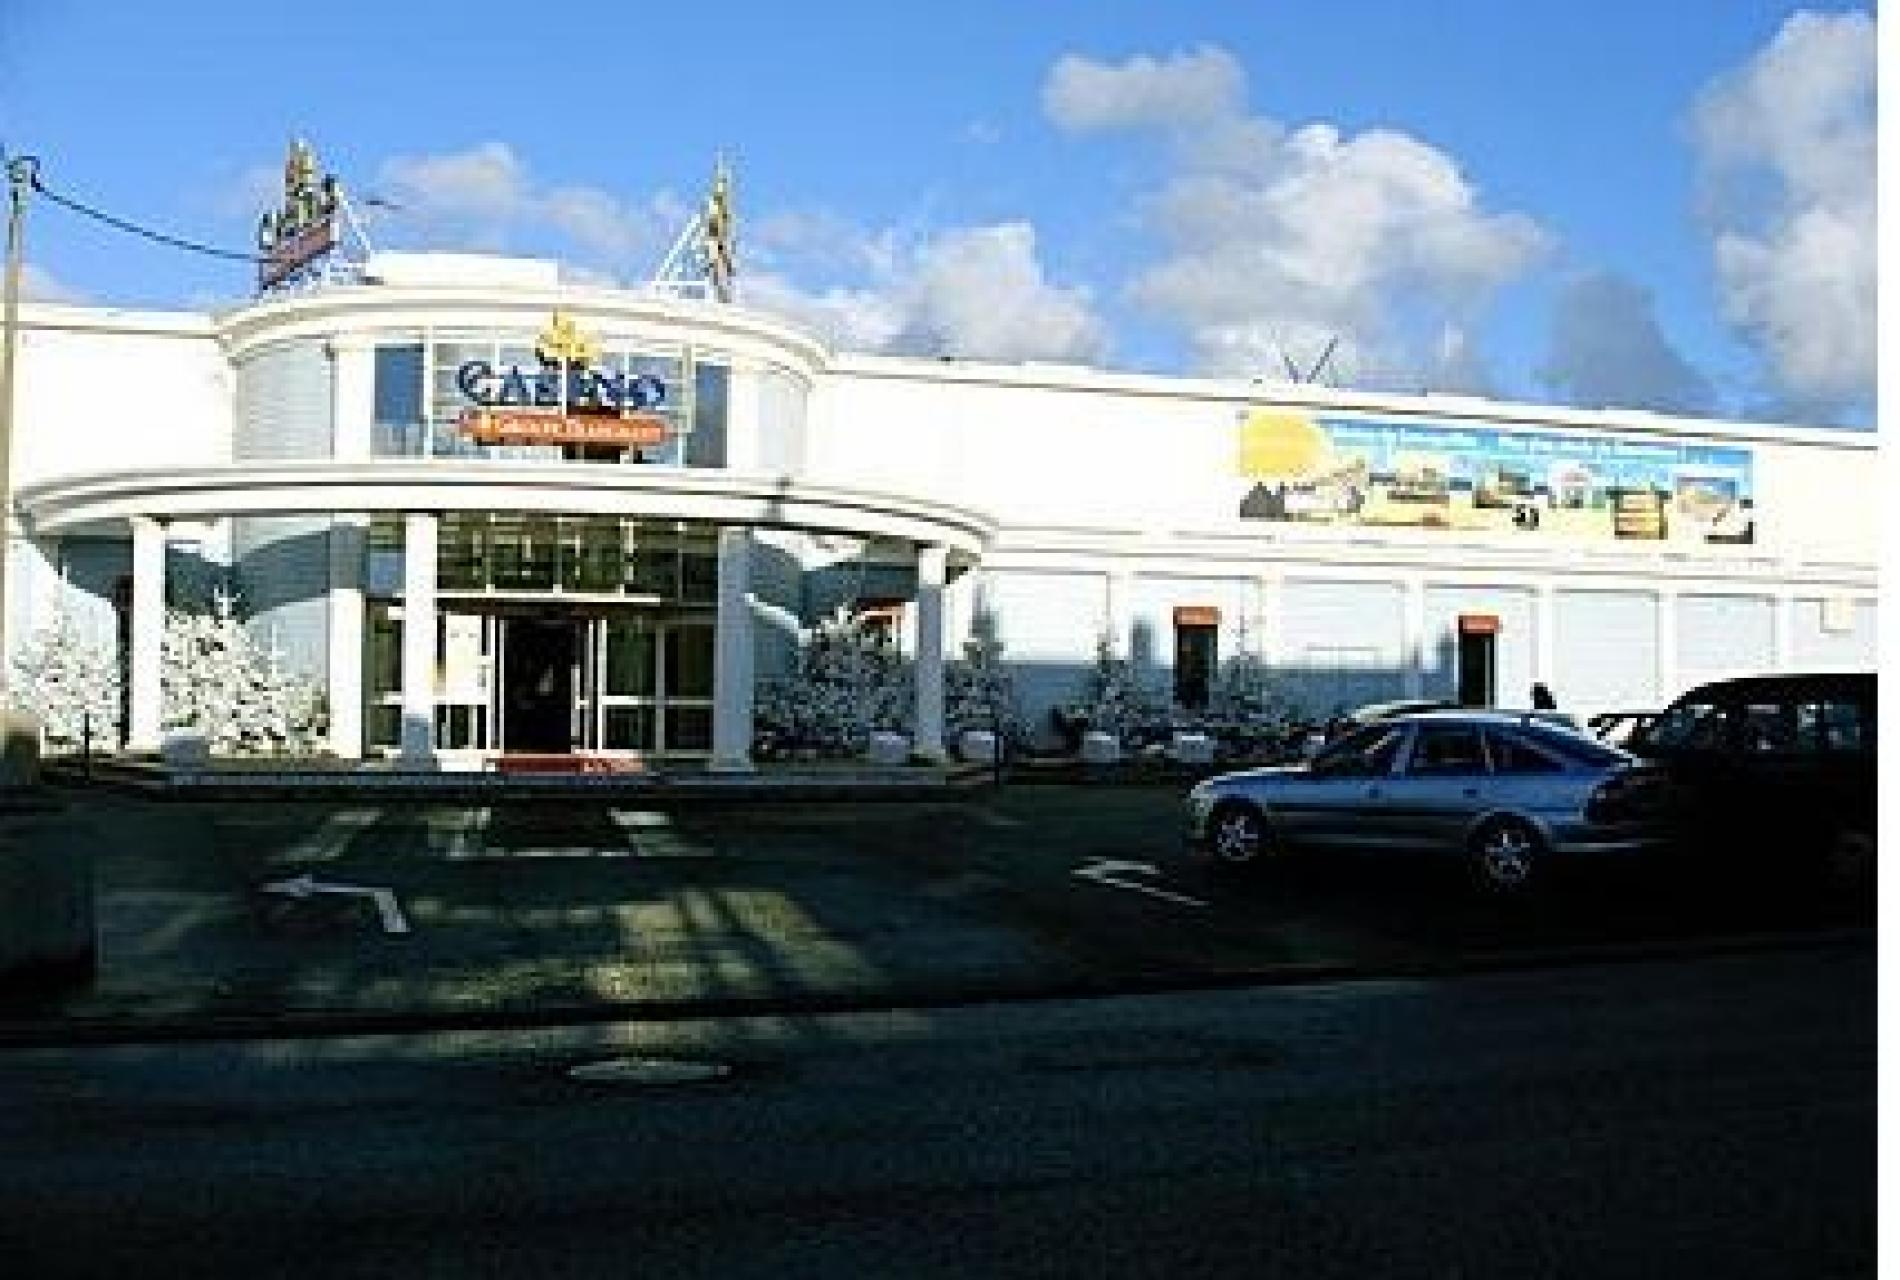 Casino De Luc sur Mer